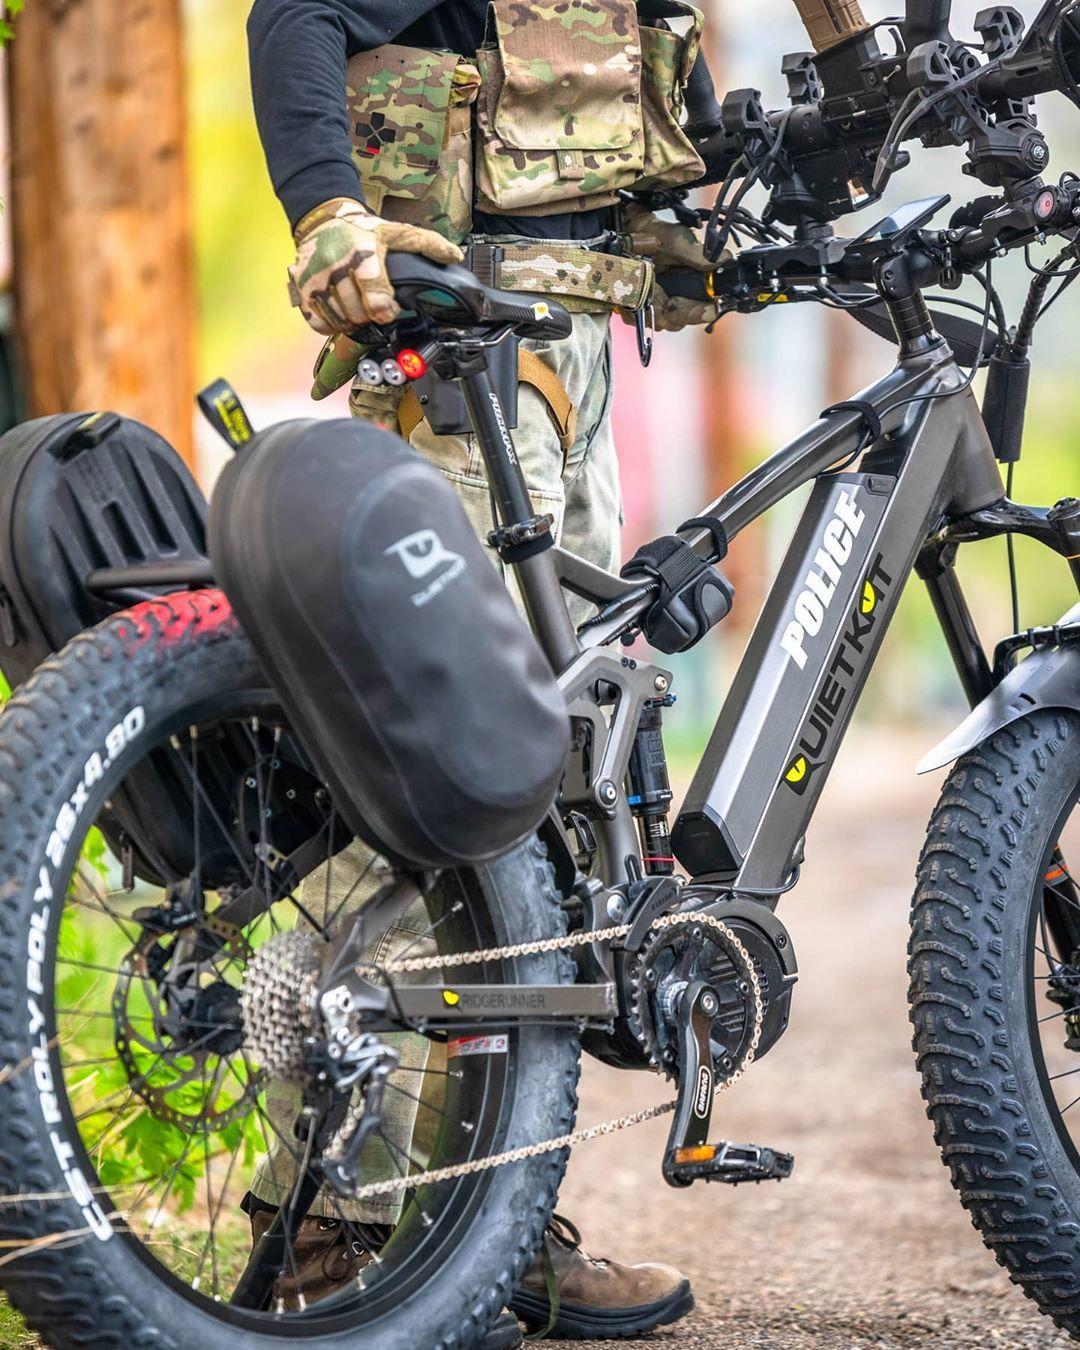 2020 Quietkat Ridgerunner Full Suspension Ebike In 2020 Mountain Biking Gear Ebike Bike Gear